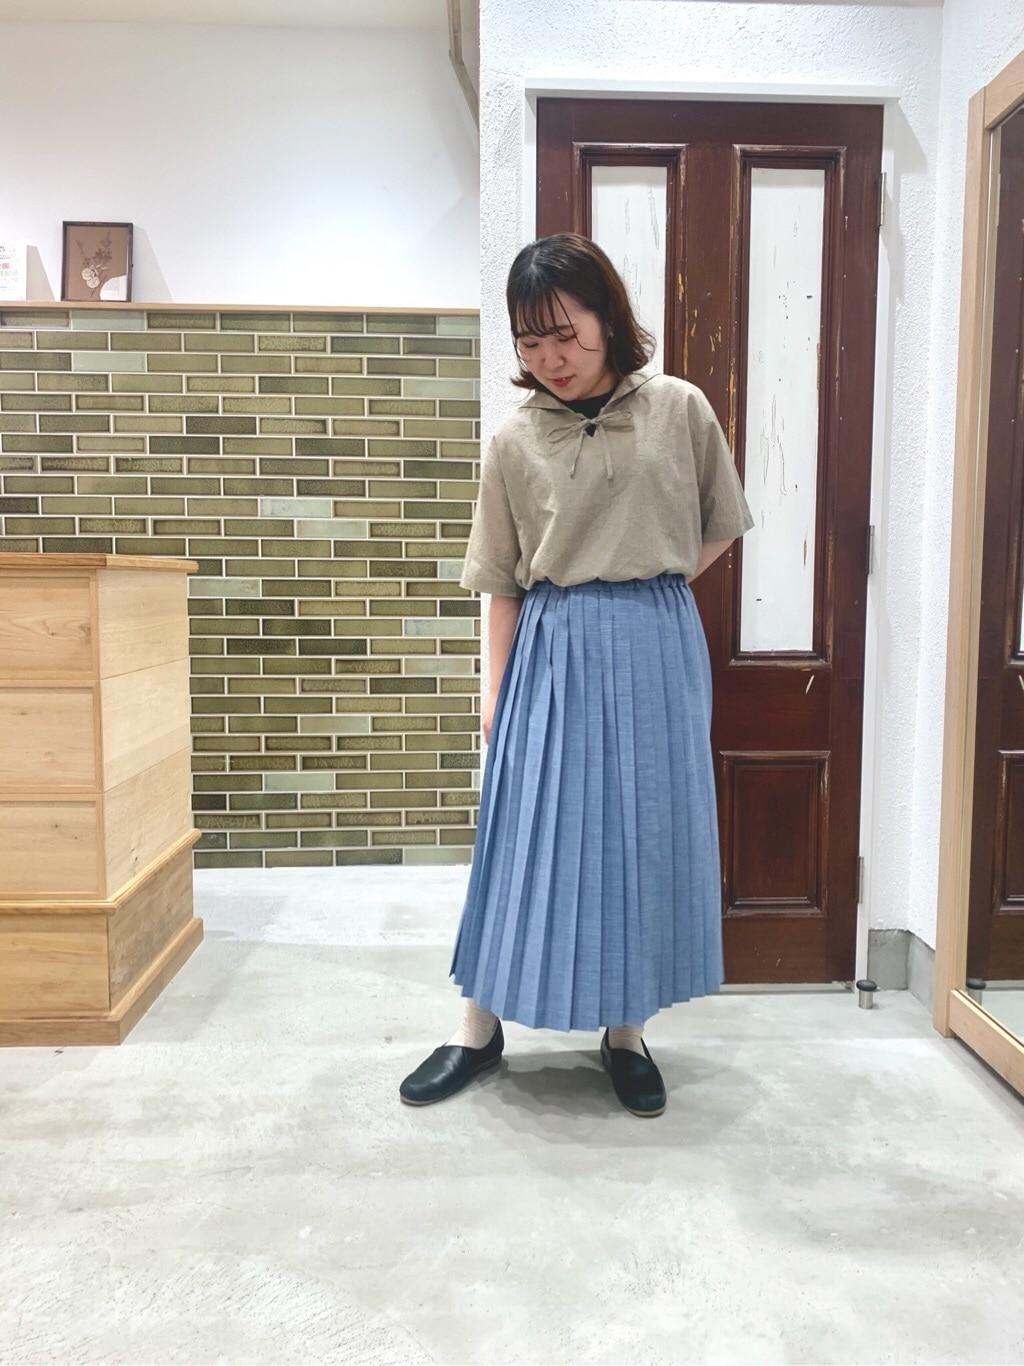 chambre de charme 横浜ジョイナス 身長:155cm 2020.07.25